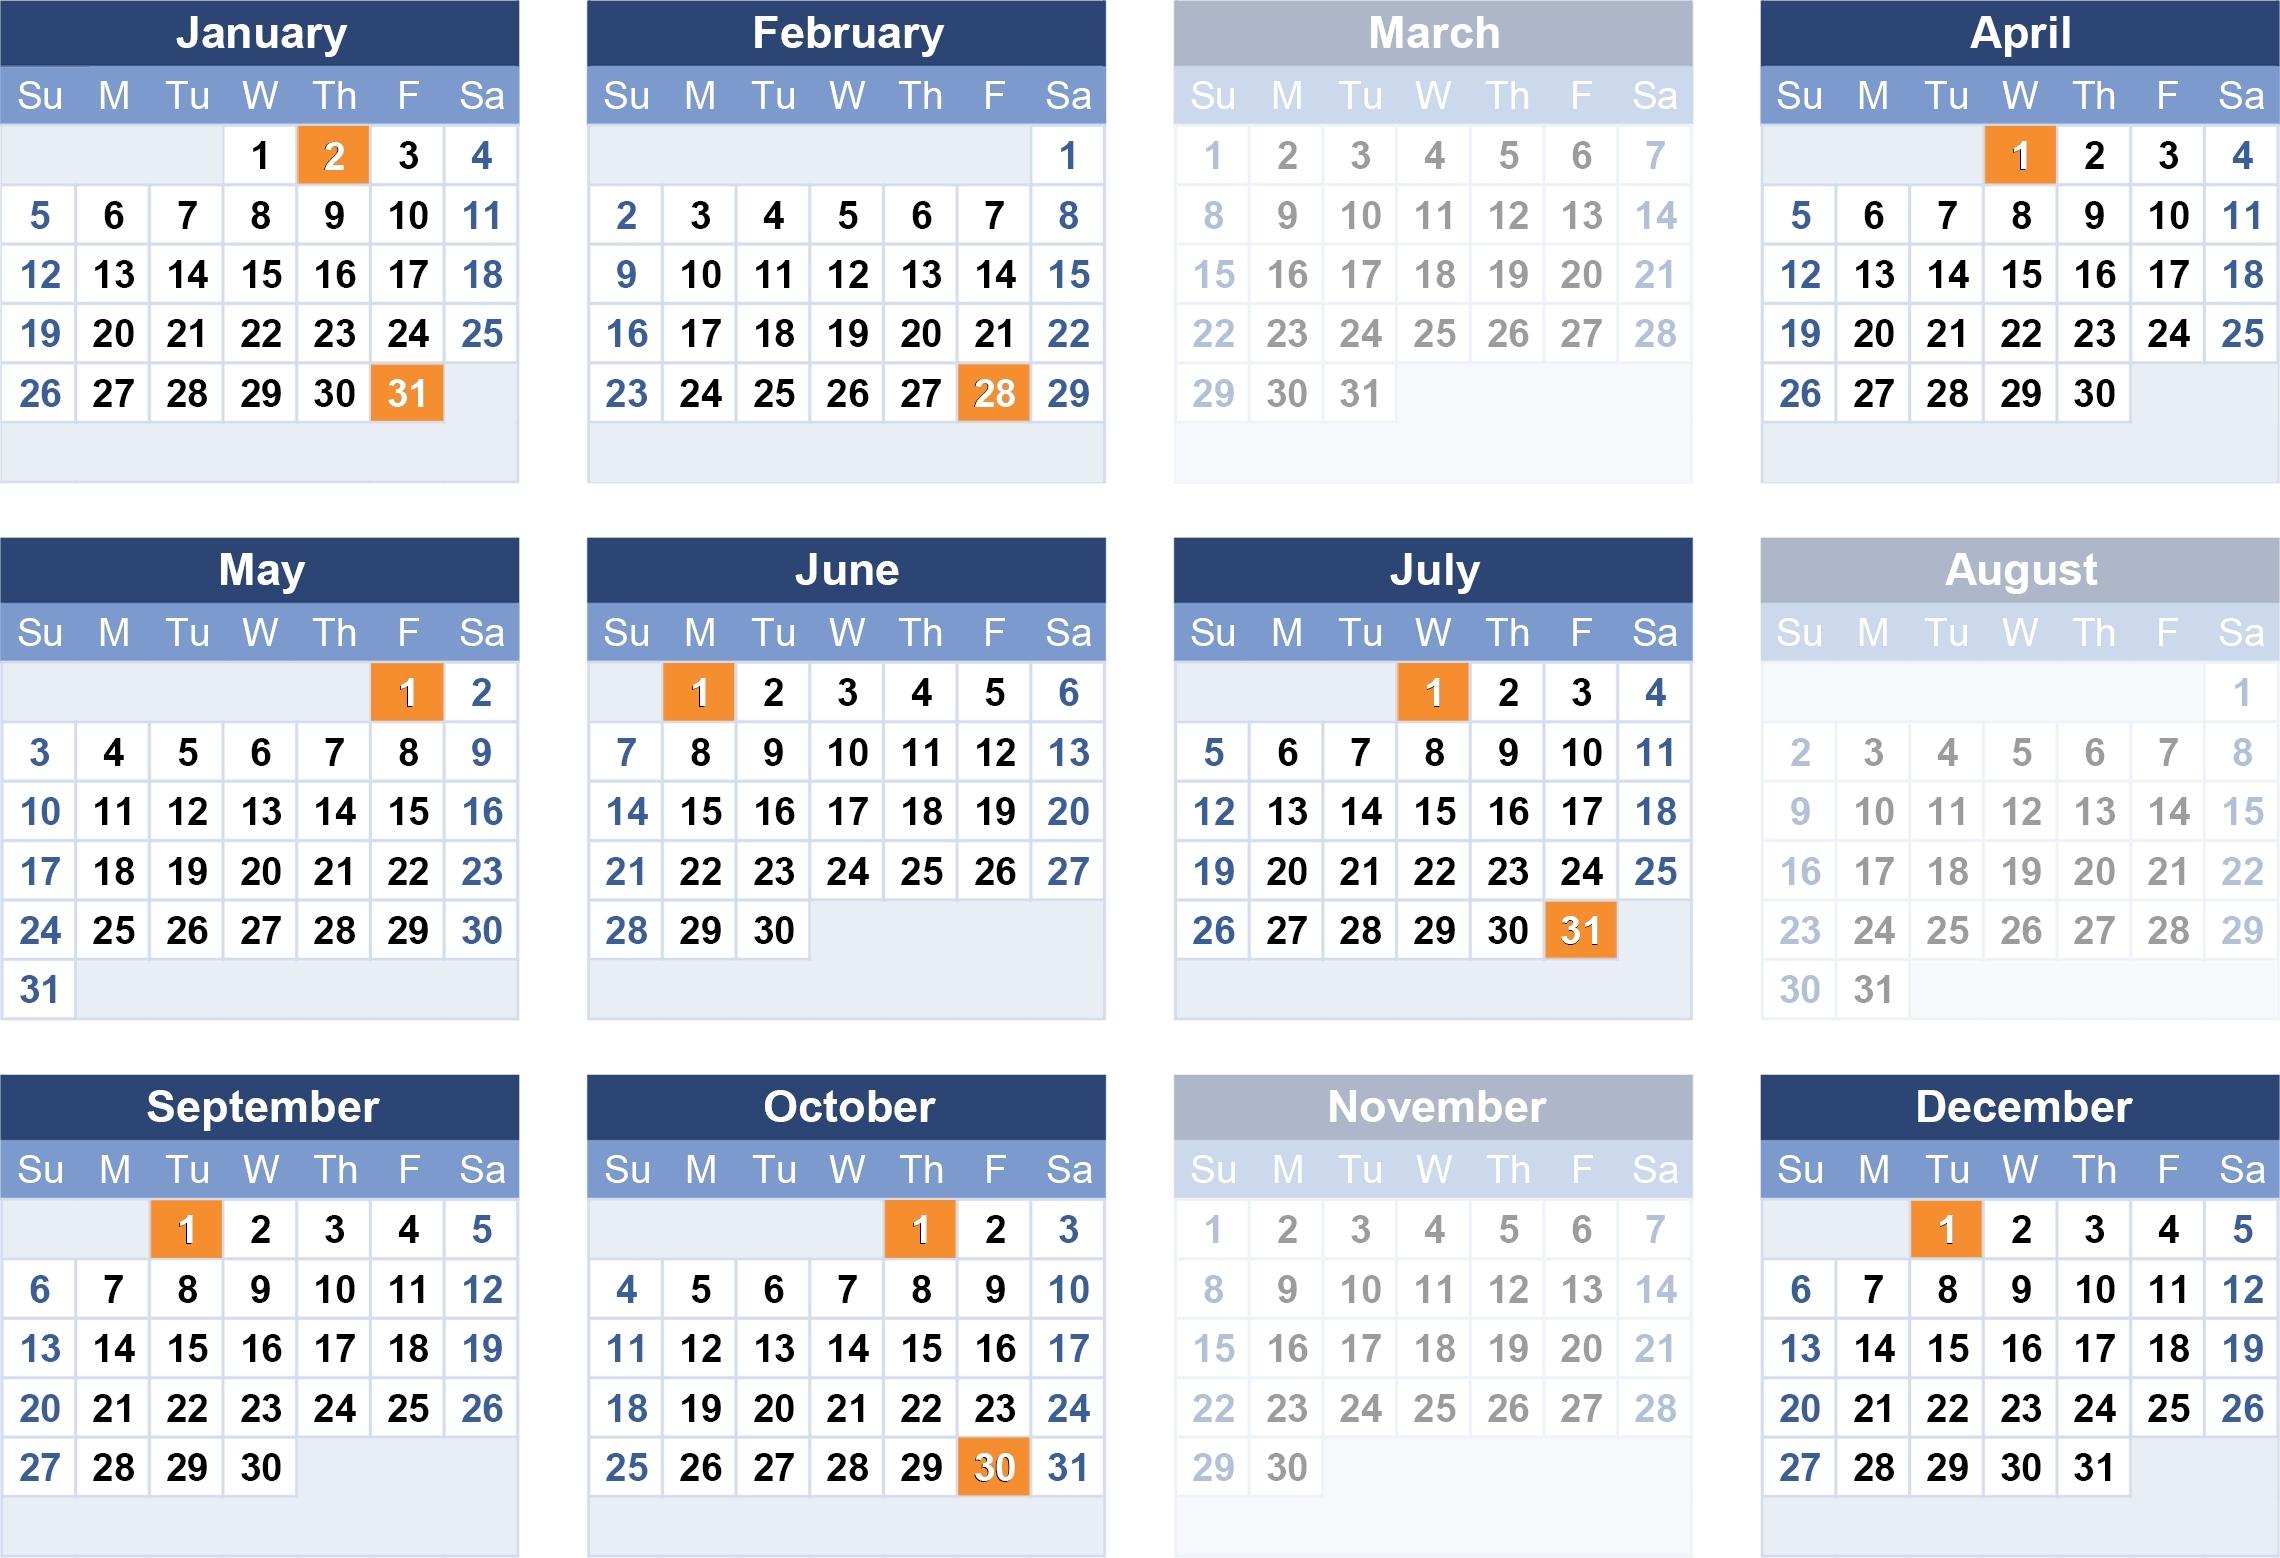 2020 Usps Postal Pay Periods - Template Calendar Design